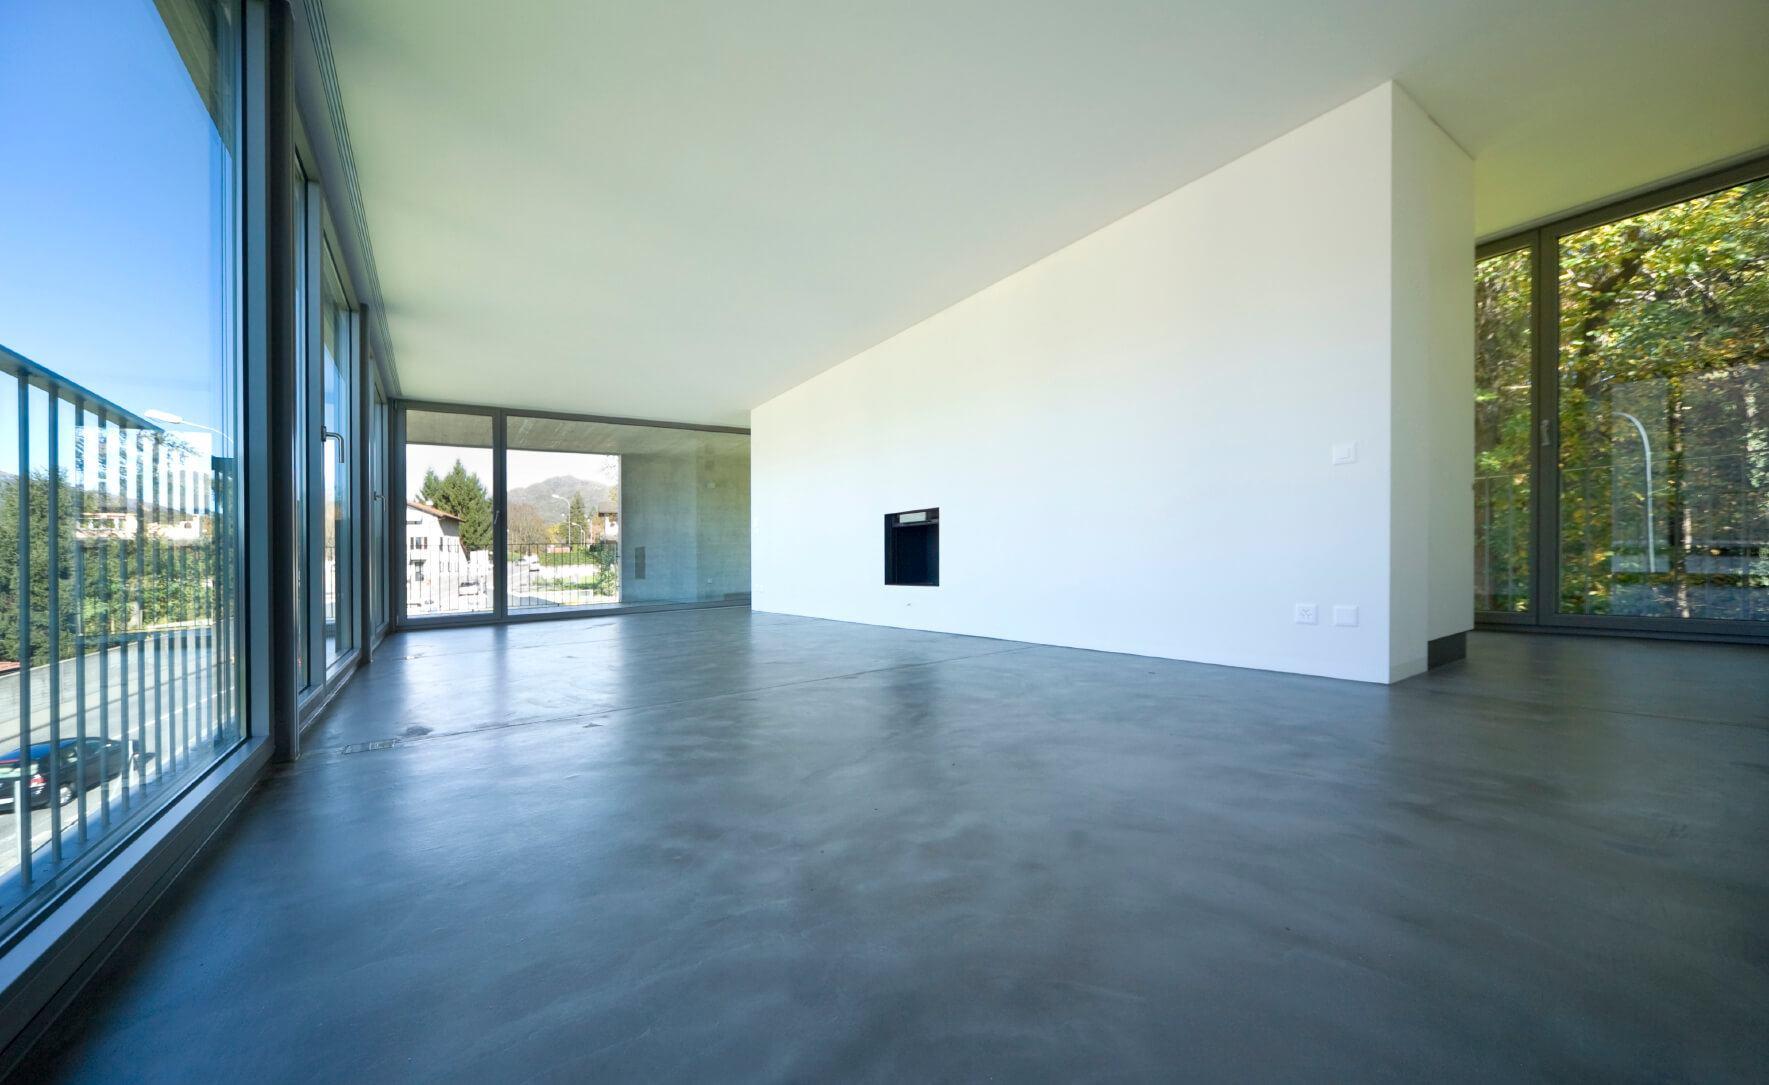 compleet samengesteld egaline pakket vanaf 10 00 p m2 bij. Black Bedroom Furniture Sets. Home Design Ideas